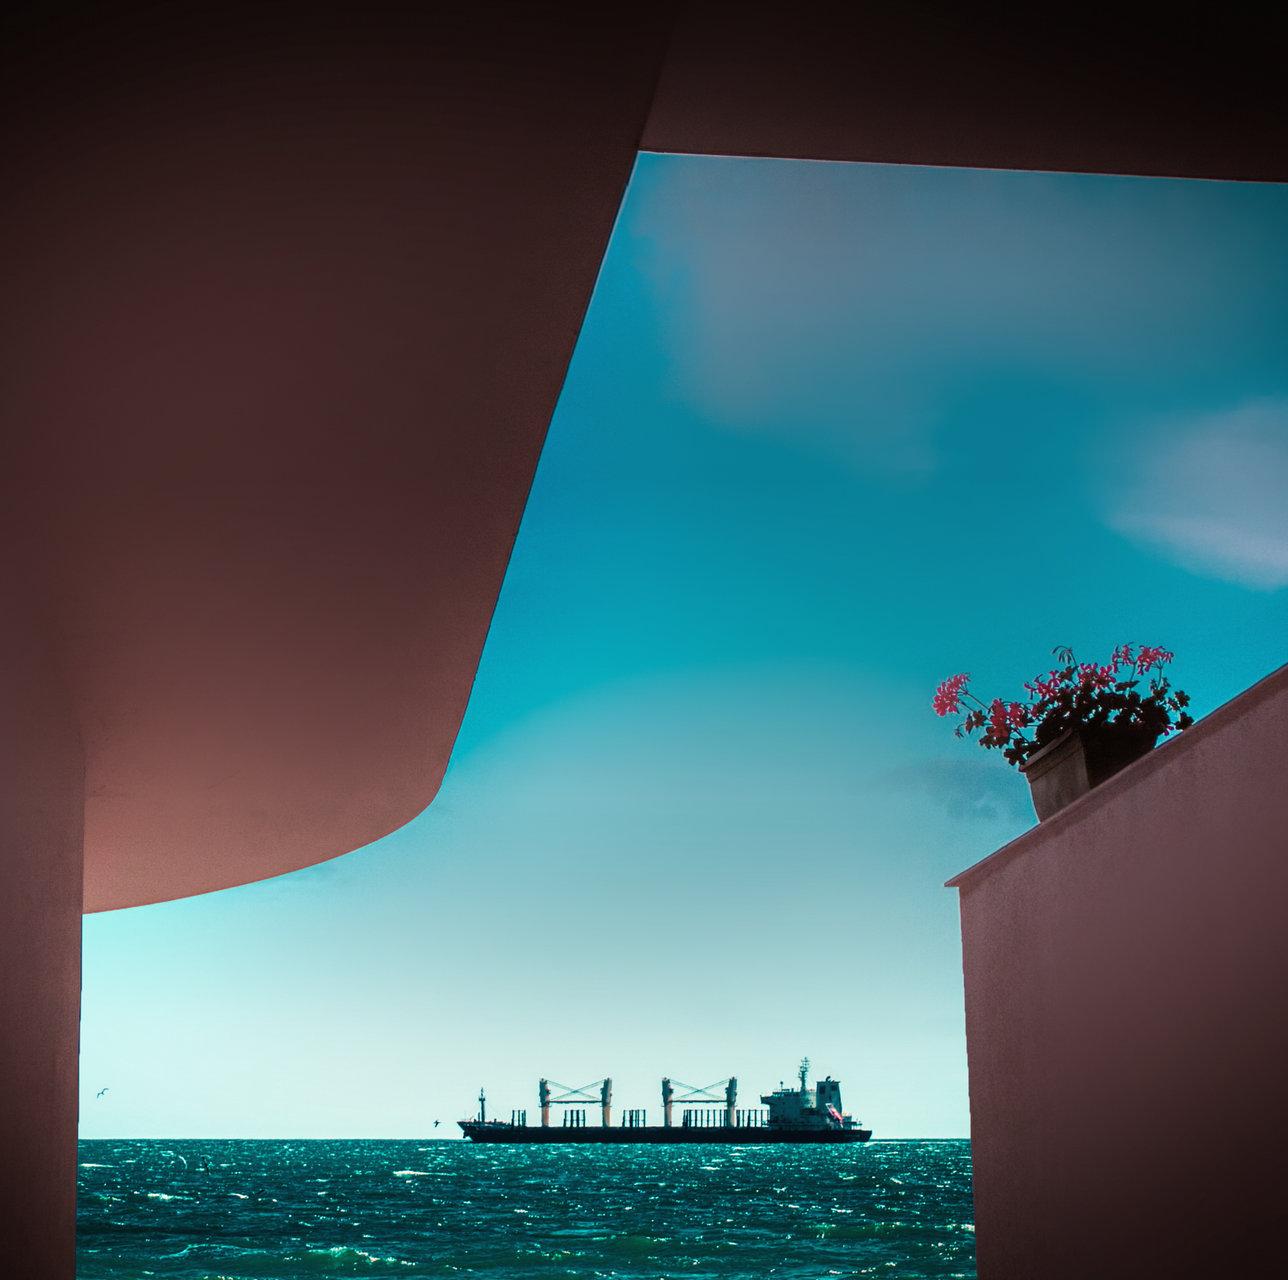 Photo in Landscape | Author tycoon  - tycoon | PHOTO FORUM